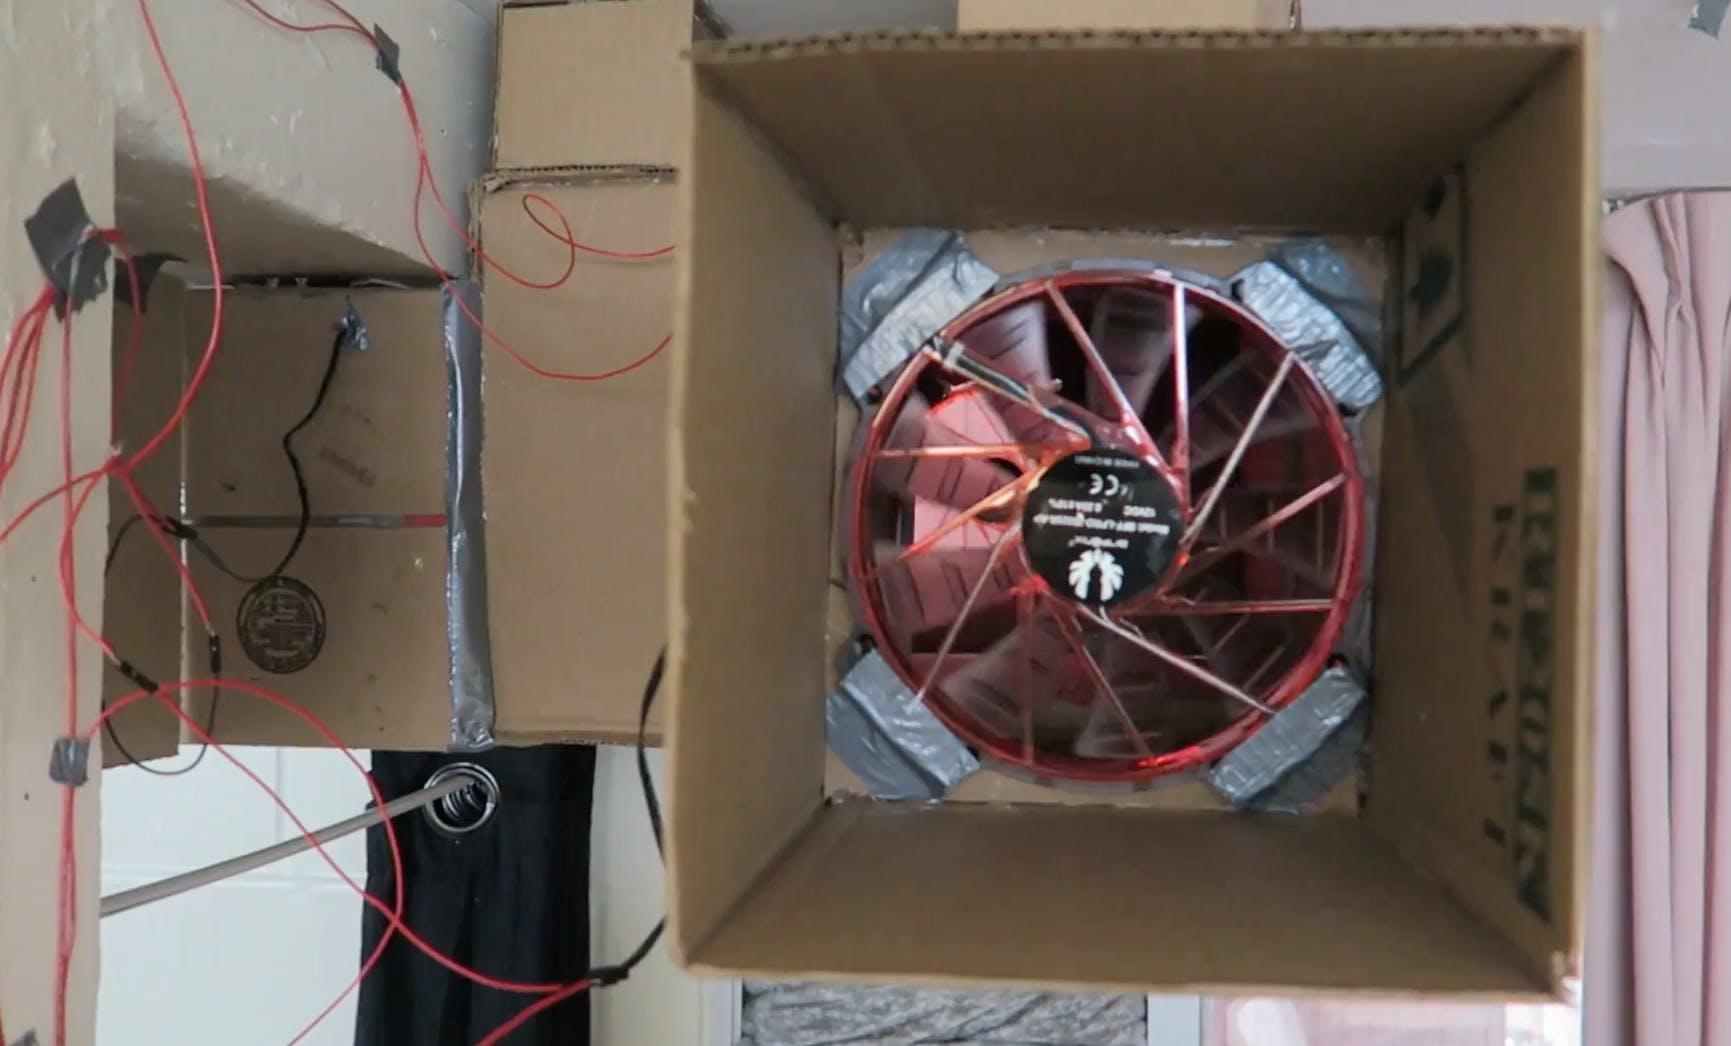 Diy Air Conditioner Built From Cardboard Hackster Io